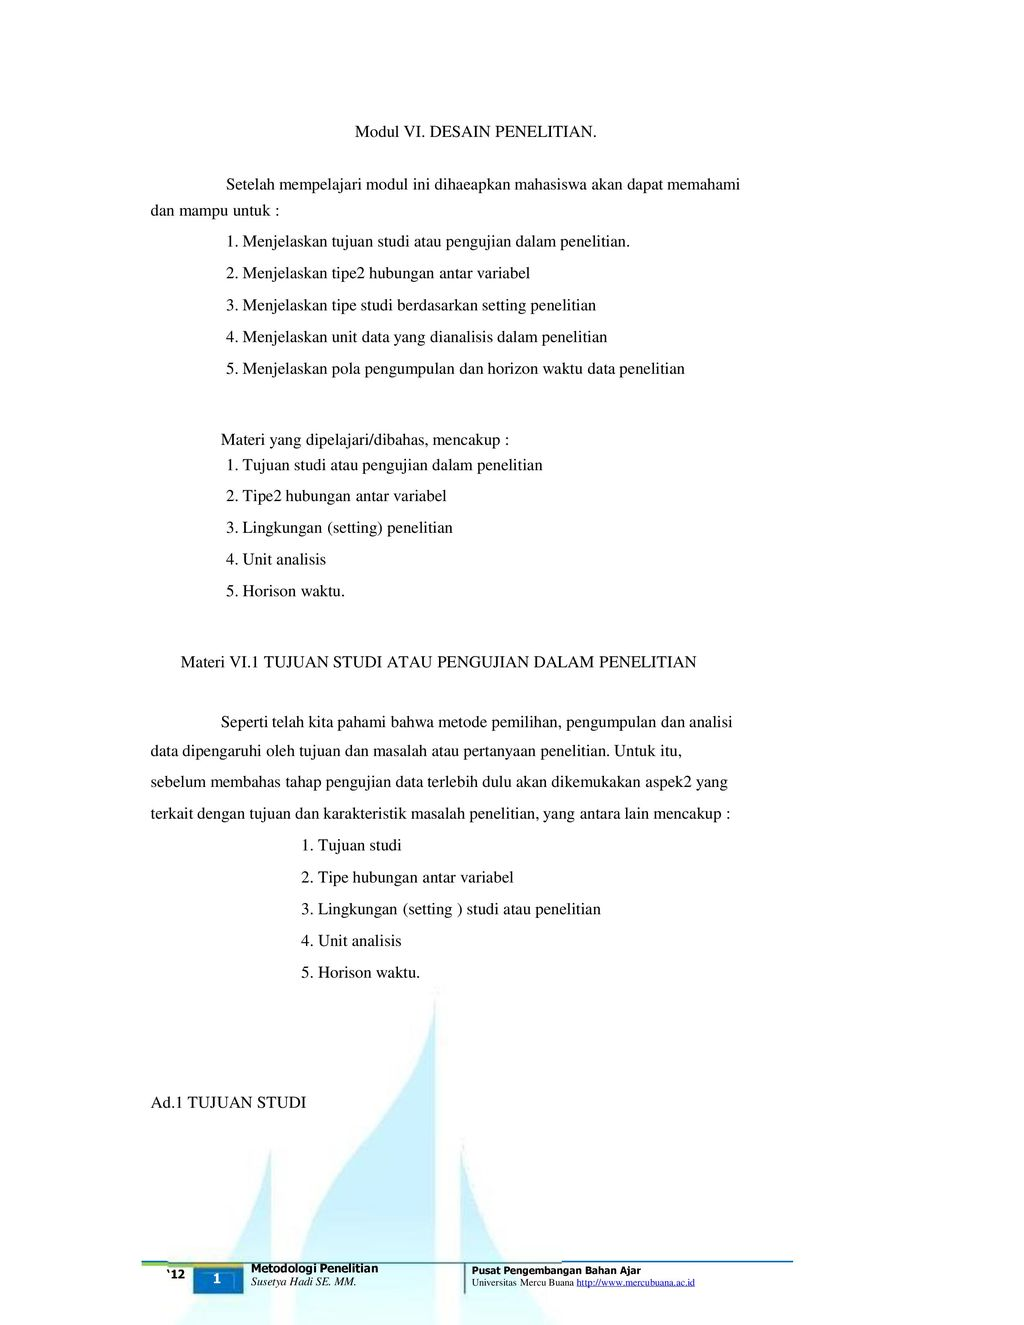 Modul Vi Desain Penelitian Ppt Download